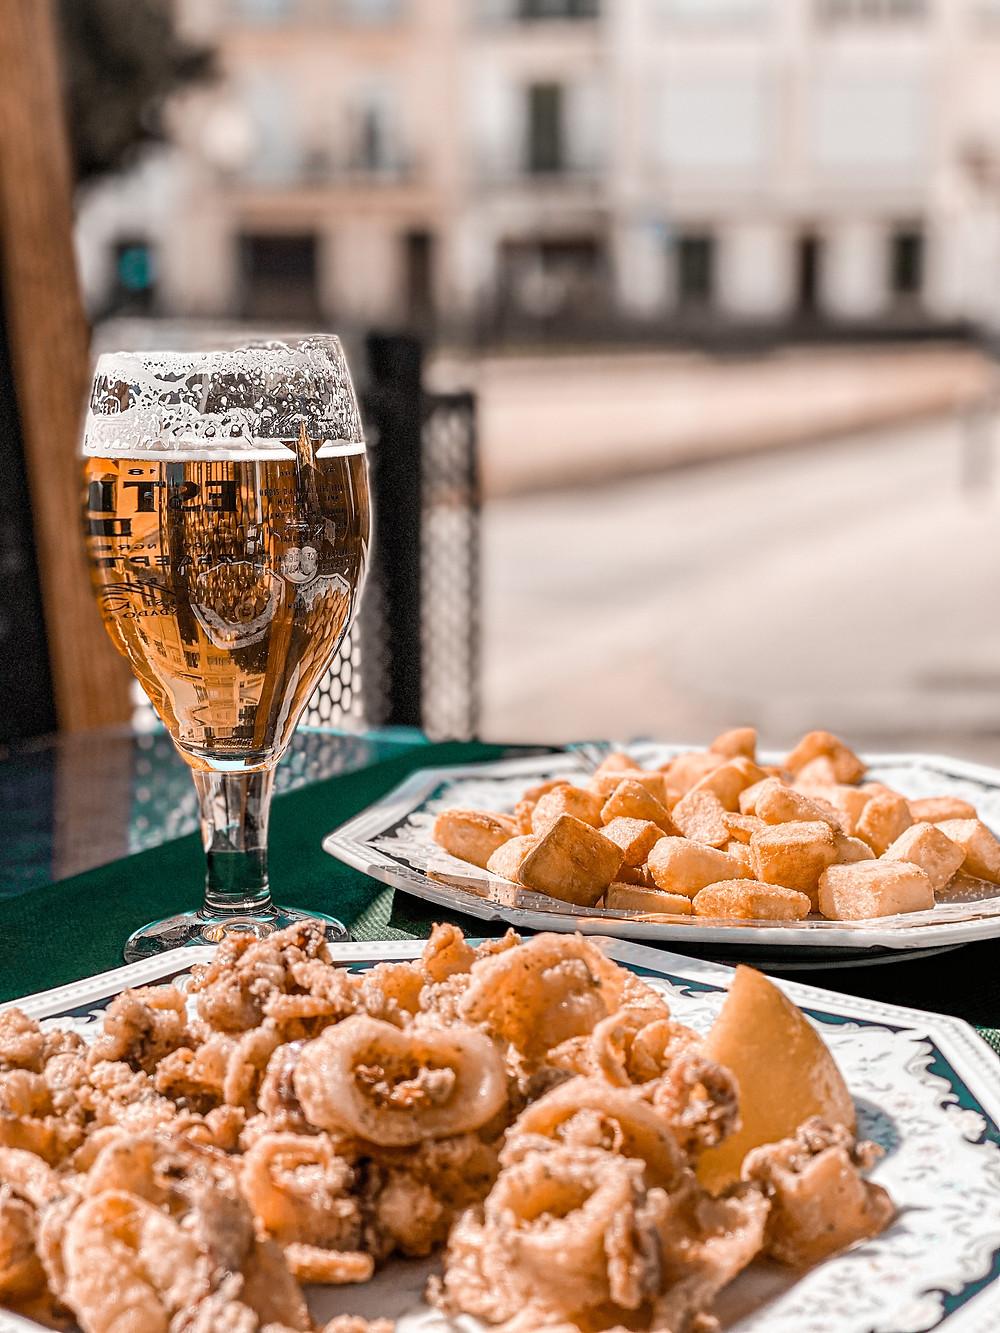 vermut, aperitivo, bravas, calamares, cerveza, Sitges, terraza